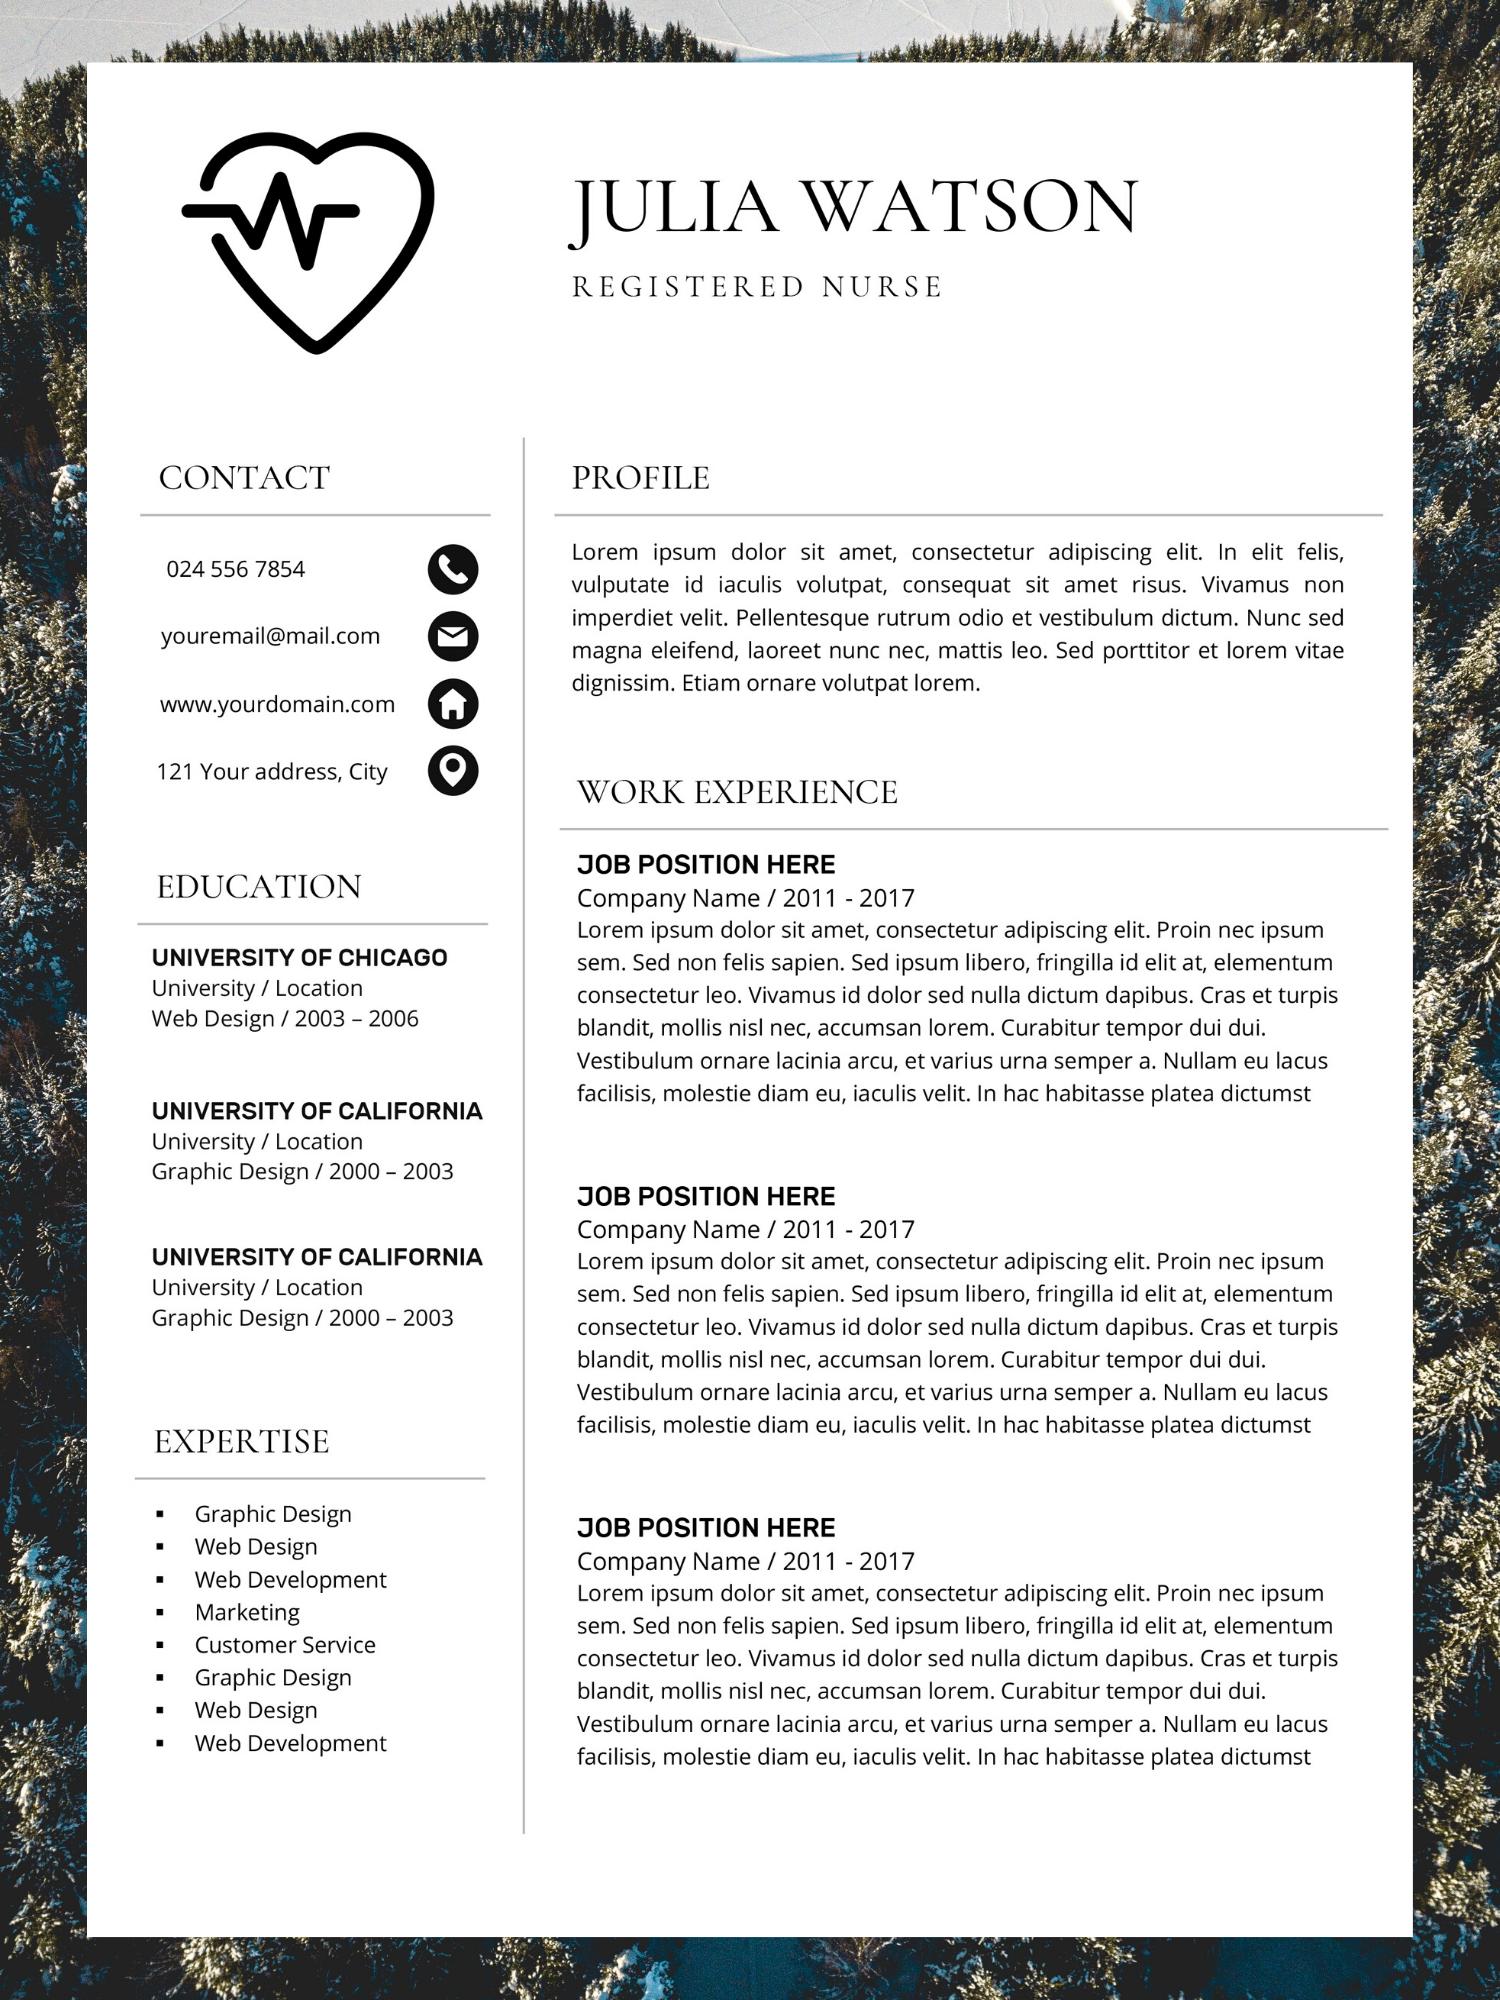 Functional Resume Resume examples, Functional resume